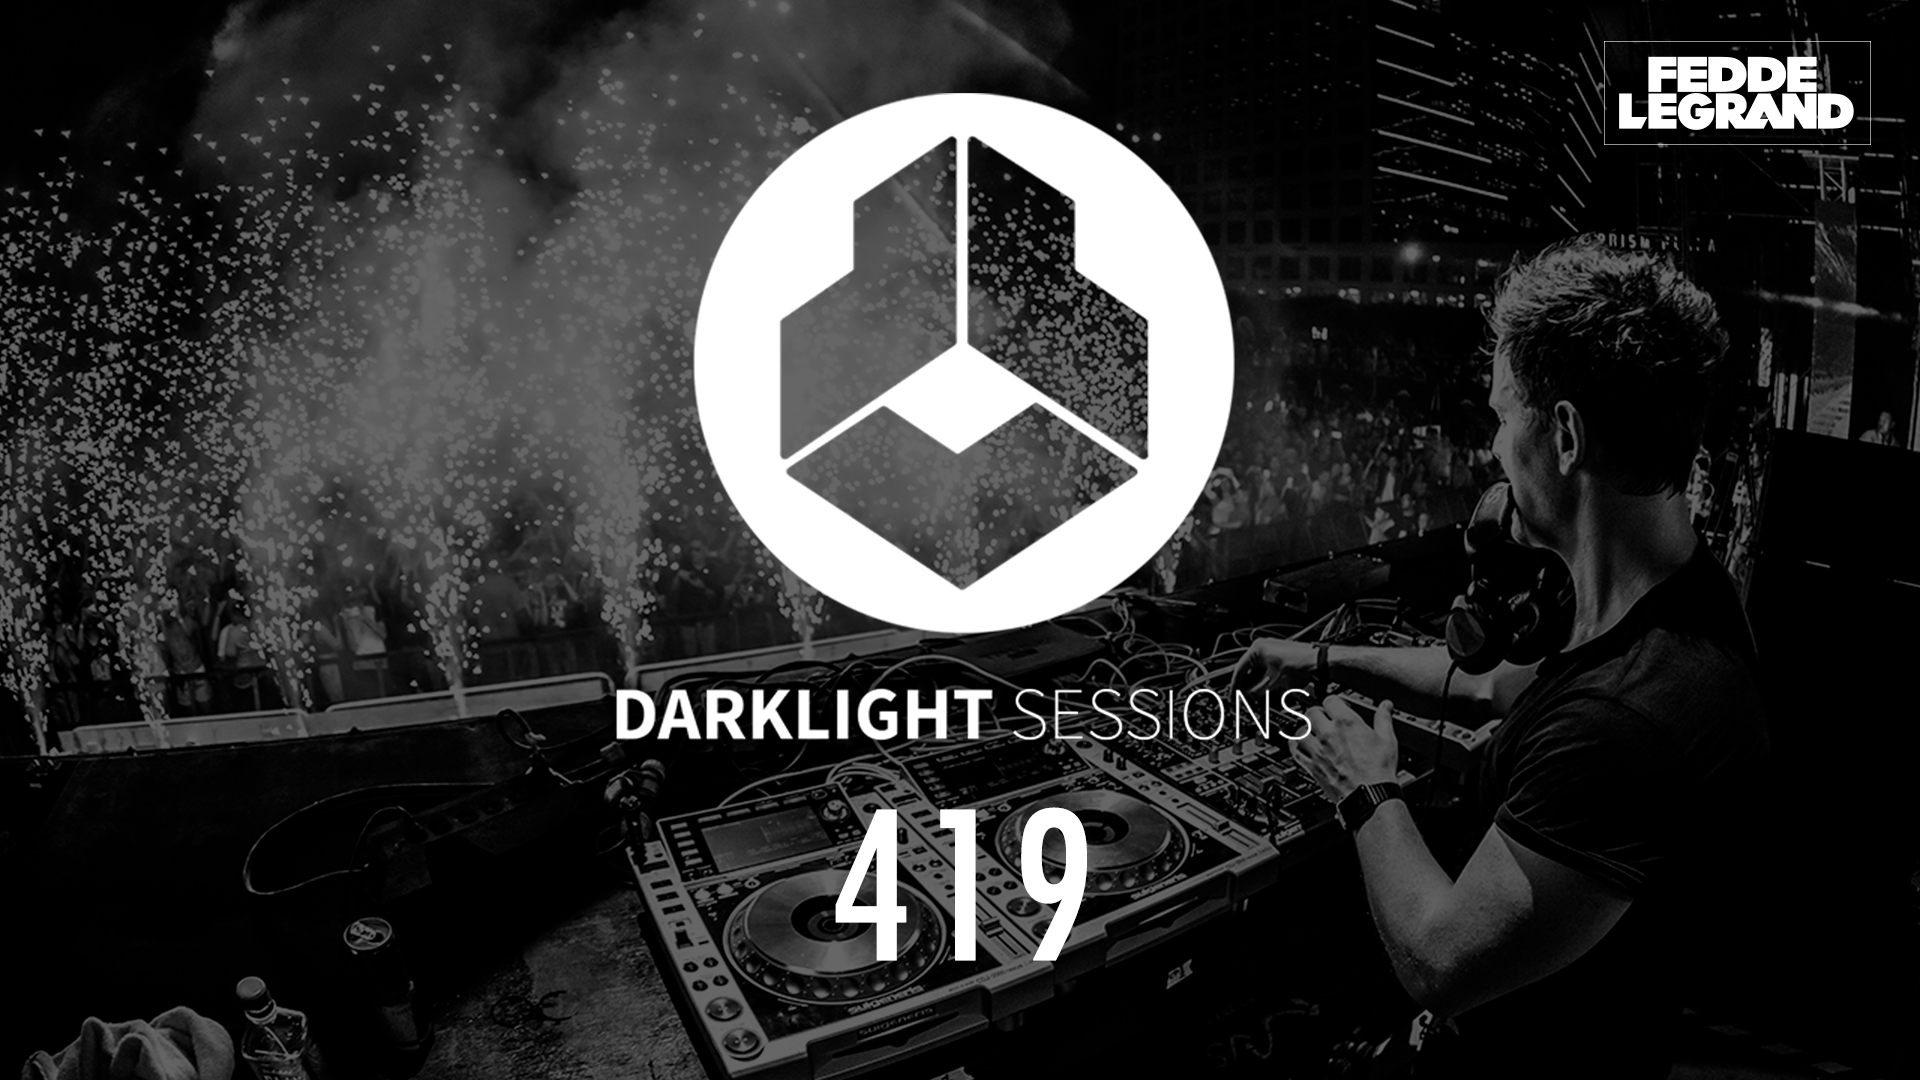 Darklight Sessions 419